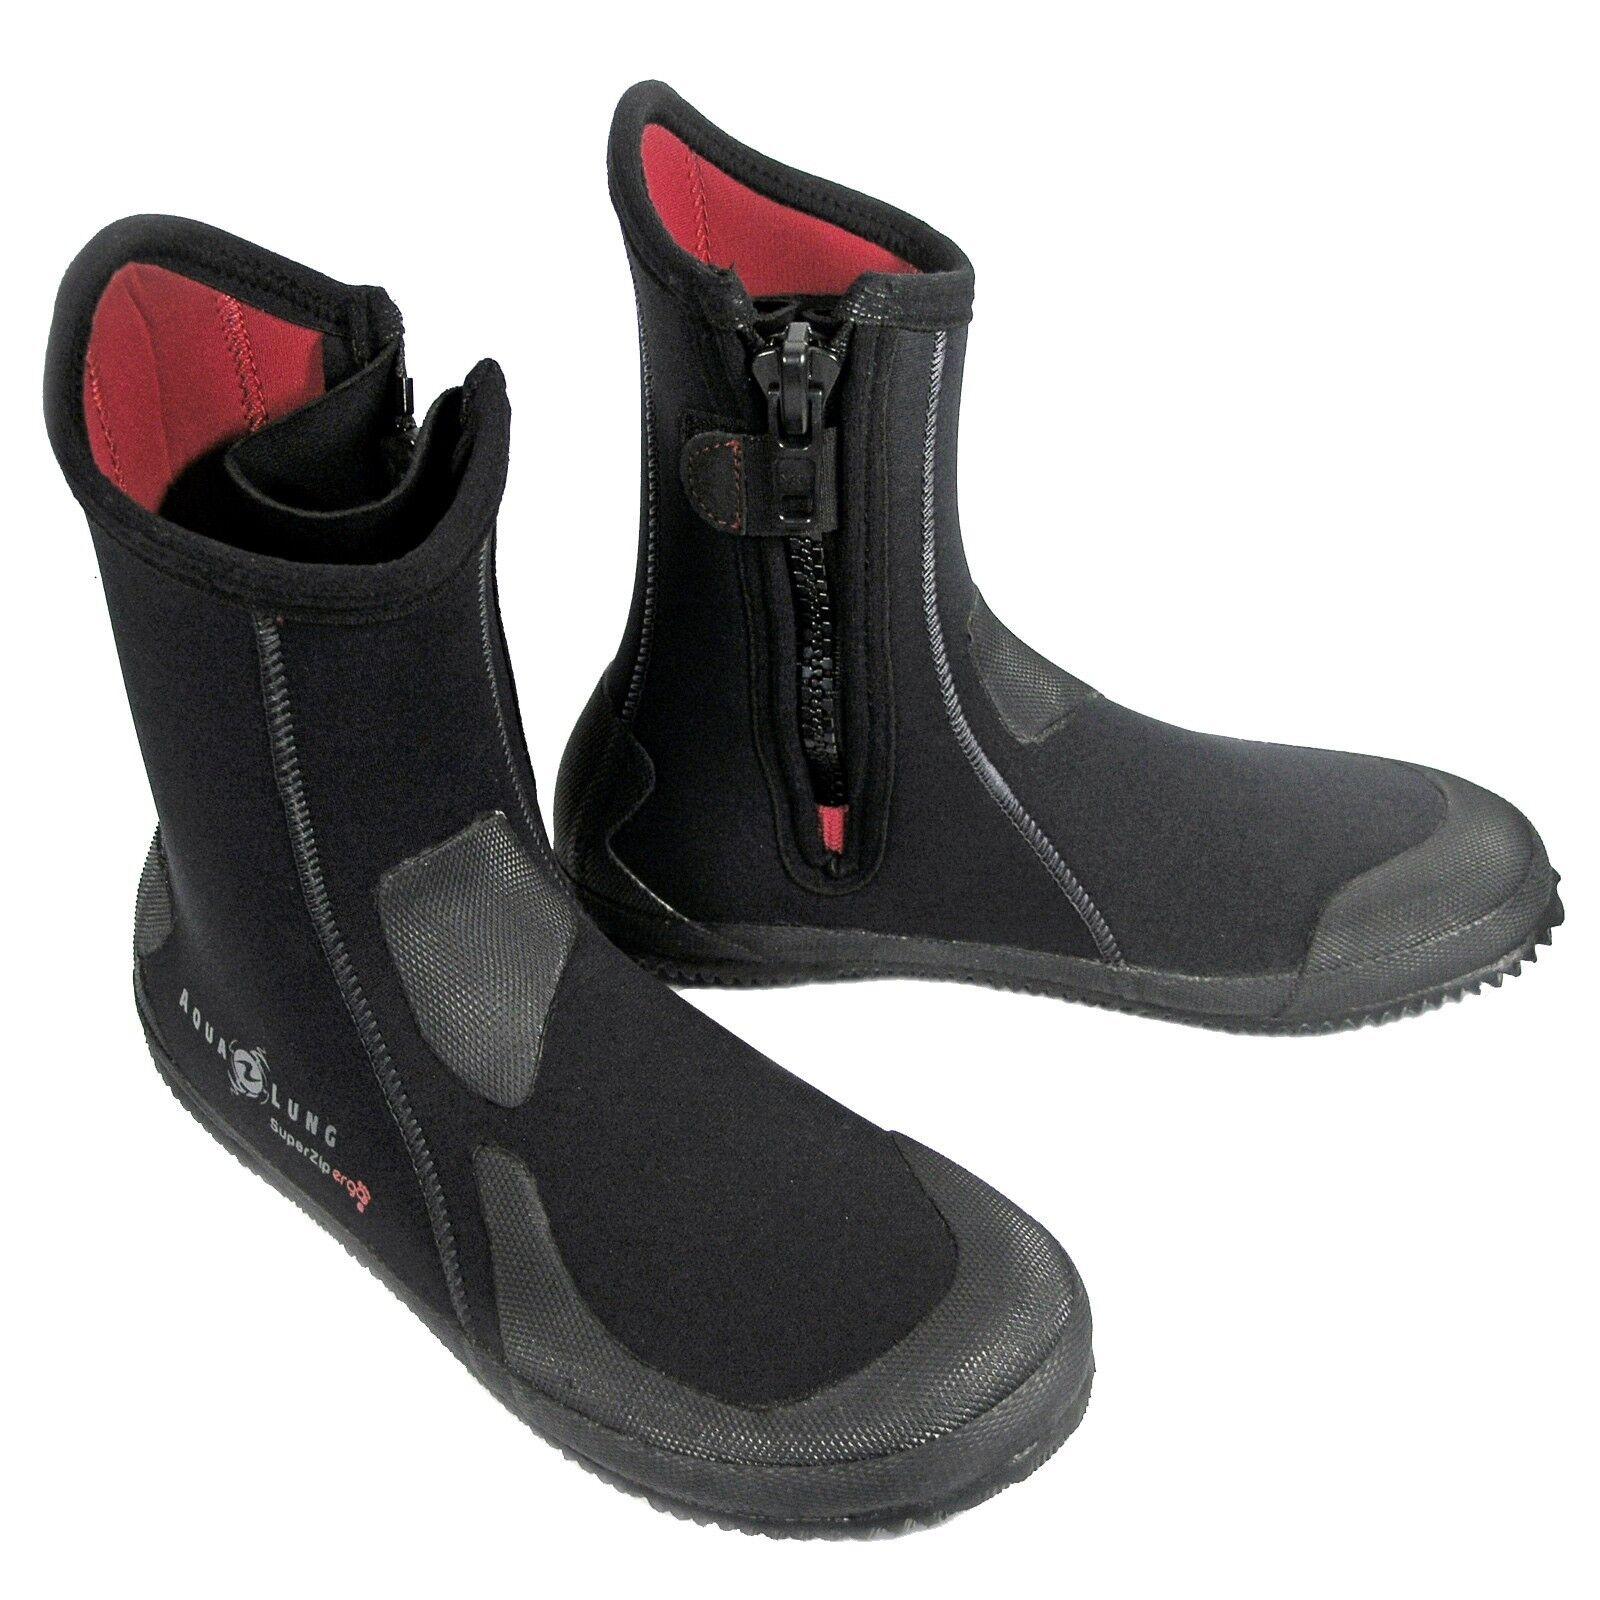 Aqualung Superzip ergo  0 1 4in Neoprene Boots with Zipper  various sizes